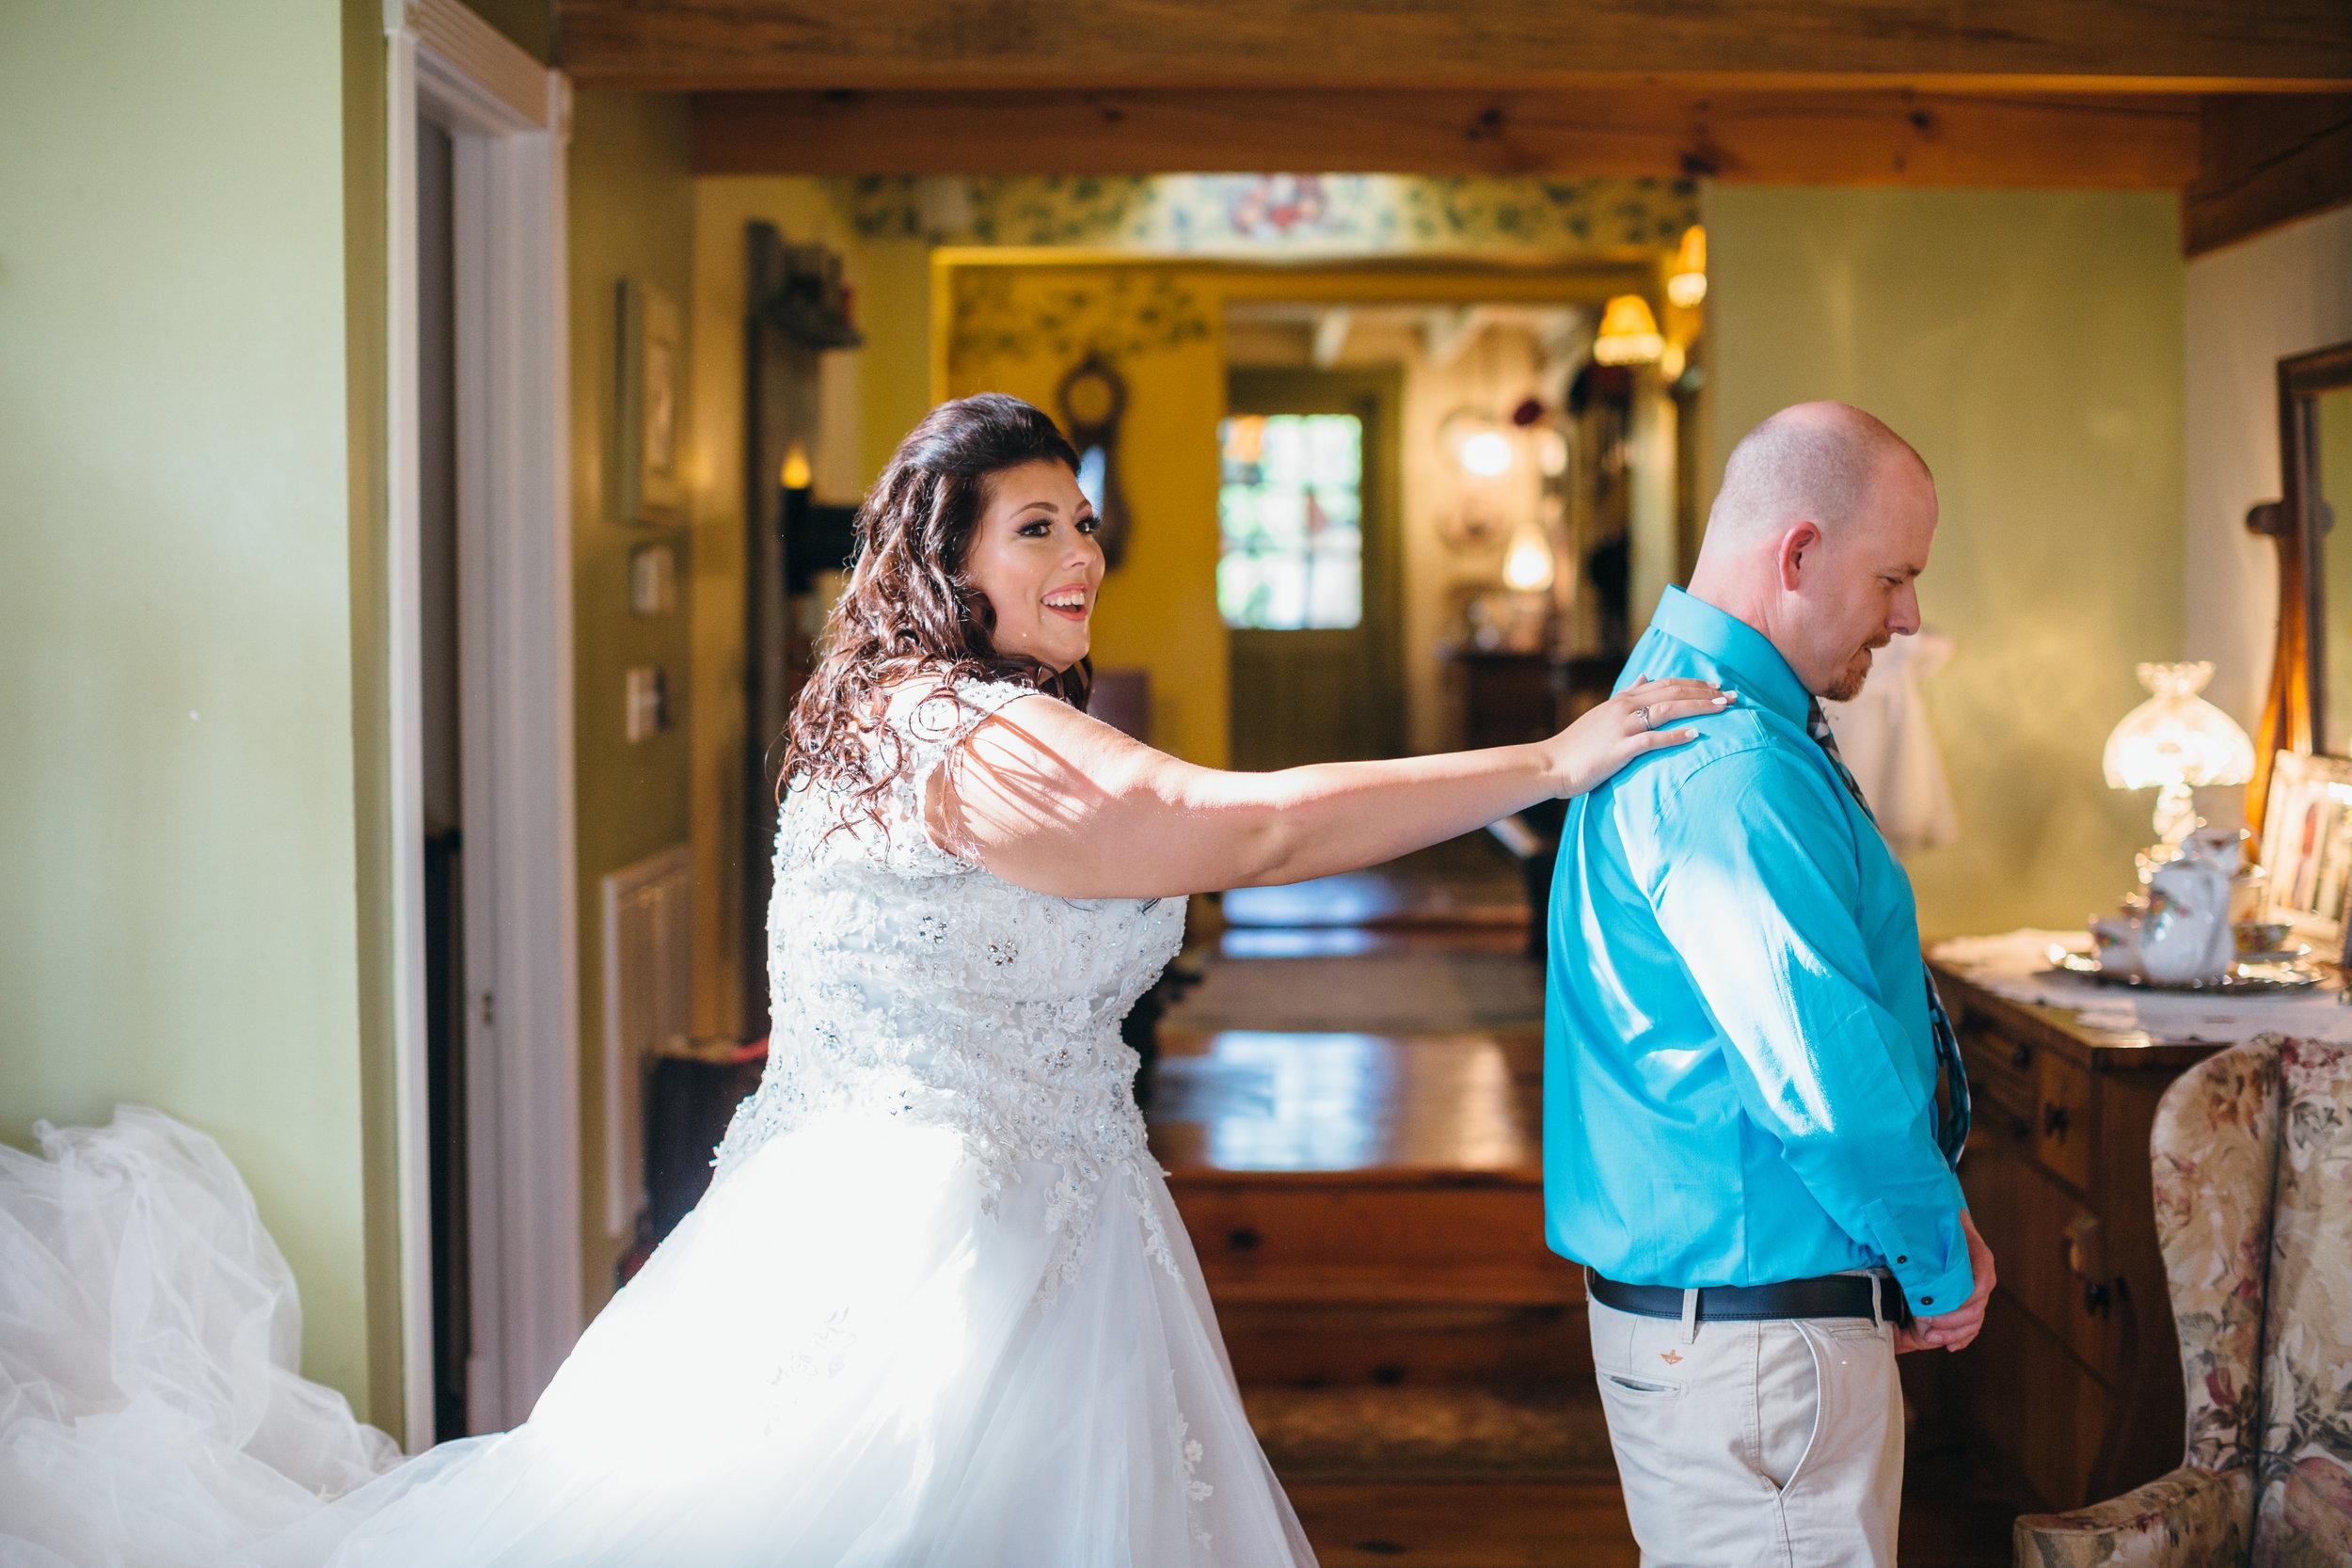 Sorella Farms_Lynchburg Wedding Photographer_Lynchburg Wedding Venue_Lynchburg Photographer-18.jpg